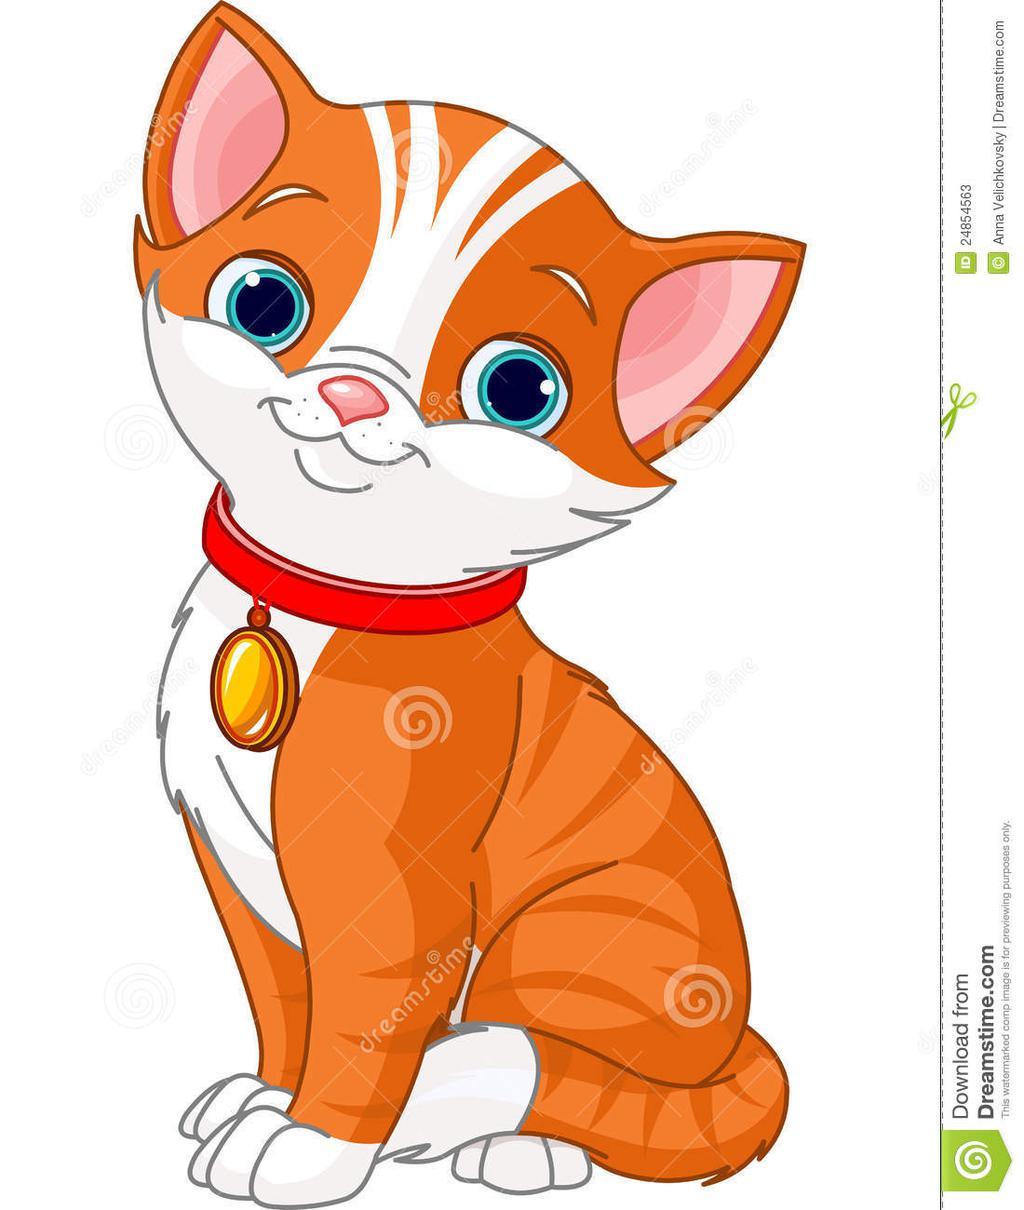 Cat pics clipart clipart Cute Cat Clipart Coon - Clipart1001 - Free Cliparts clipart